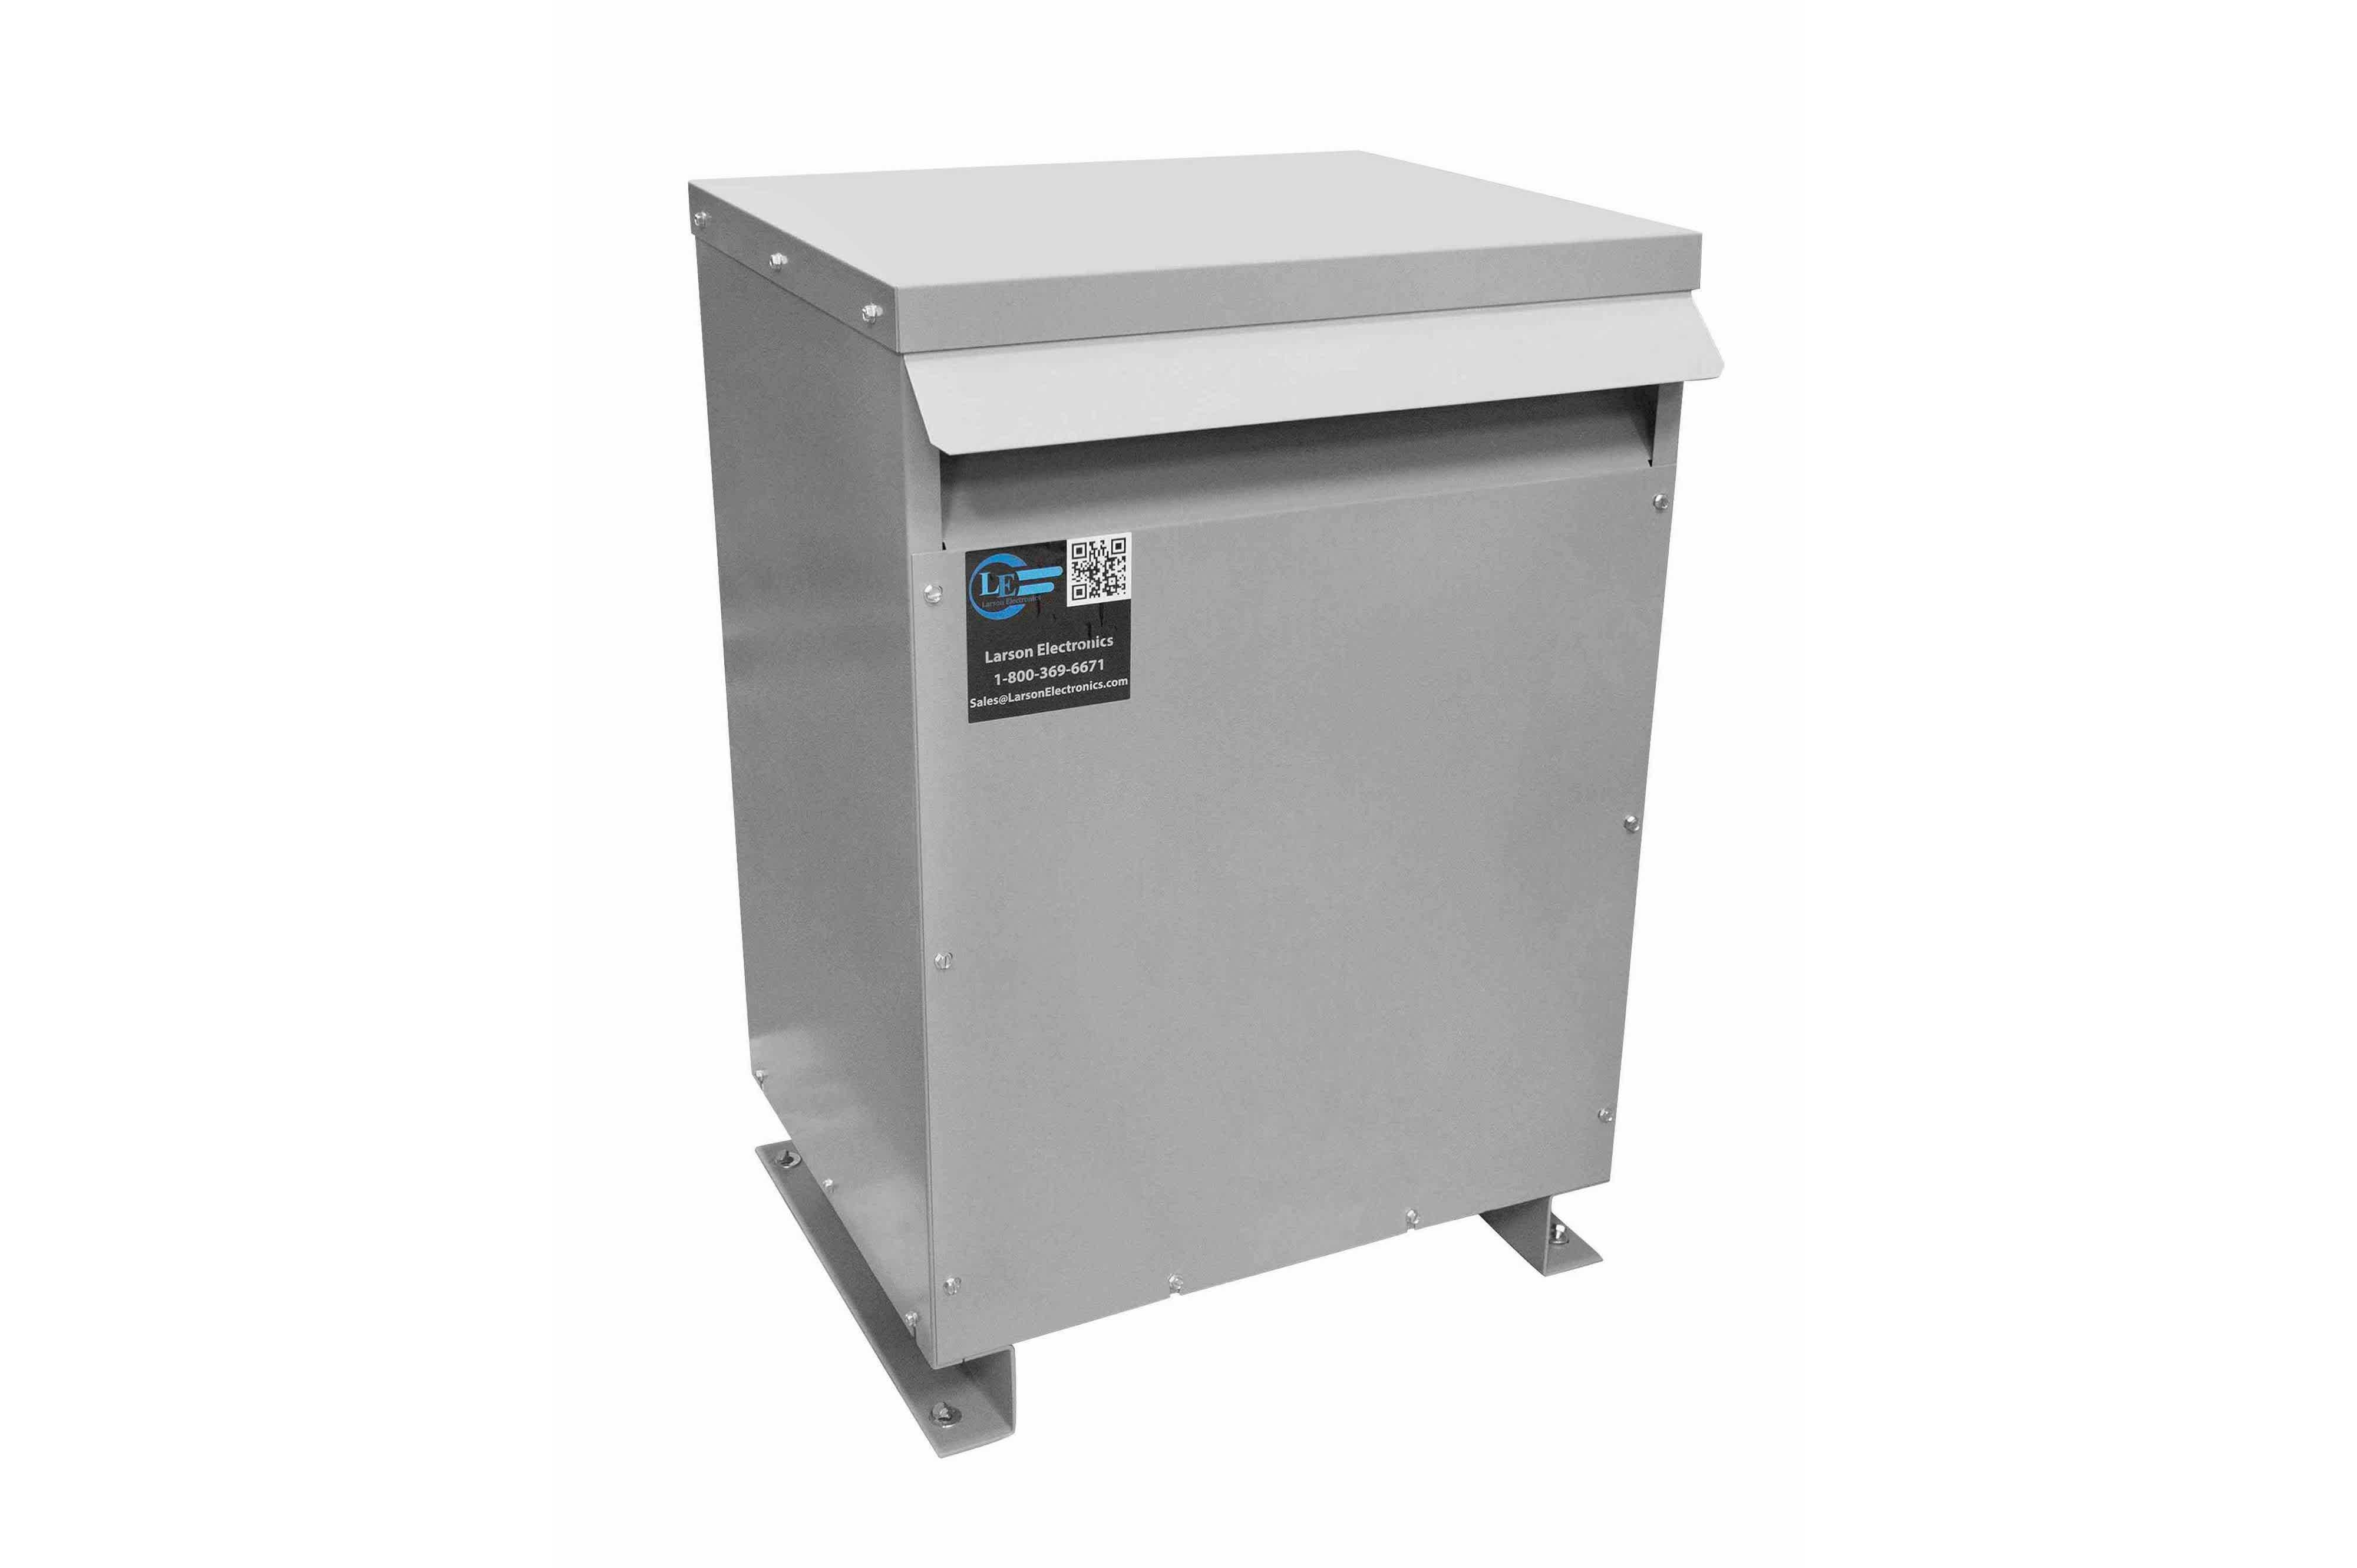 55 kVA 3PH Isolation Transformer, 380V Wye Primary, 240V/120 Delta Secondary, N3R, Ventilated, 60 Hz